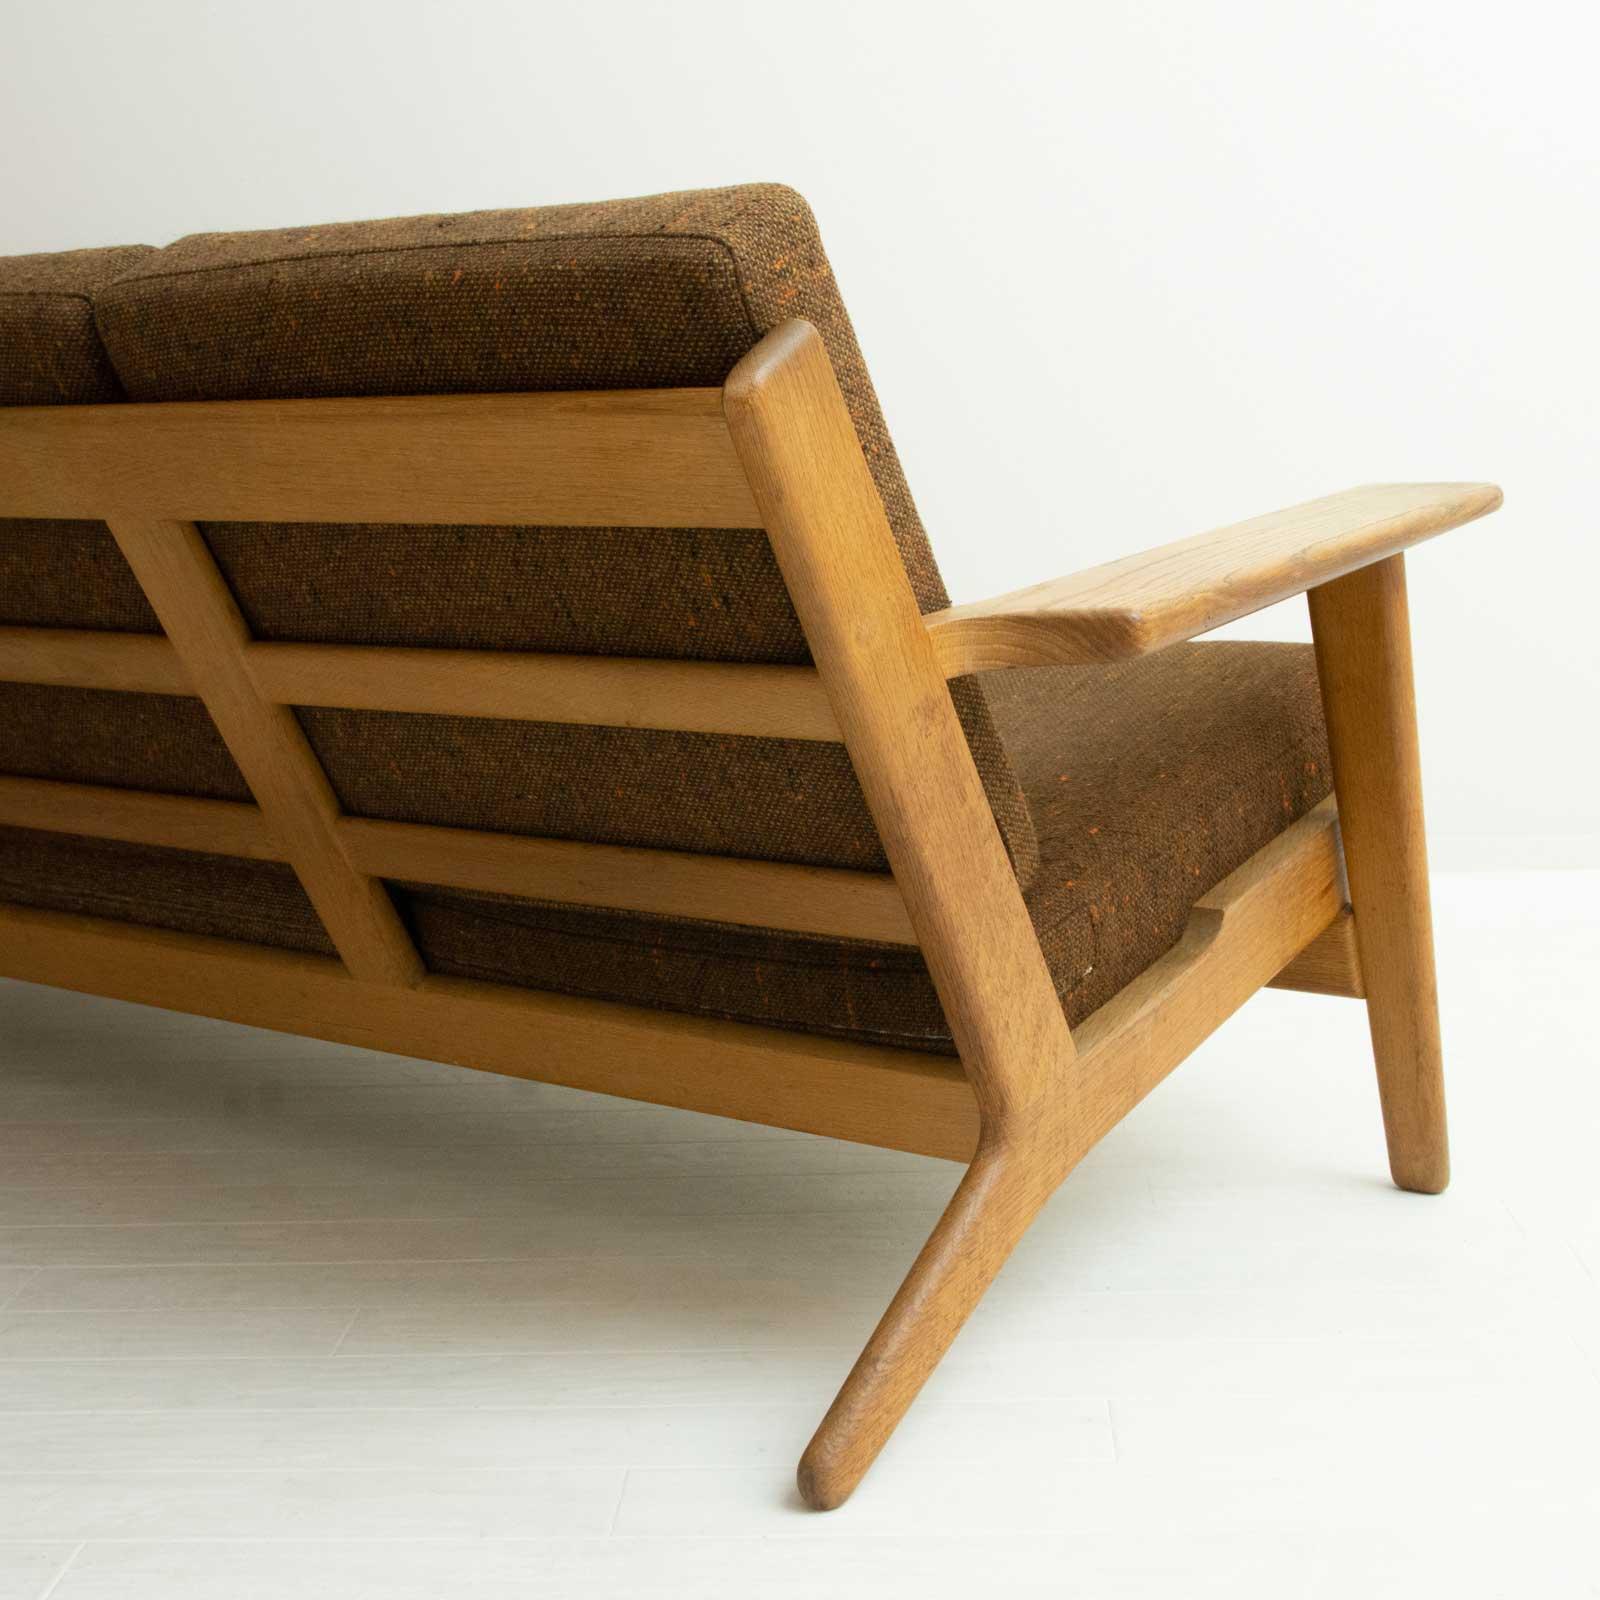 GE290 Sofa by Hans J Wegner